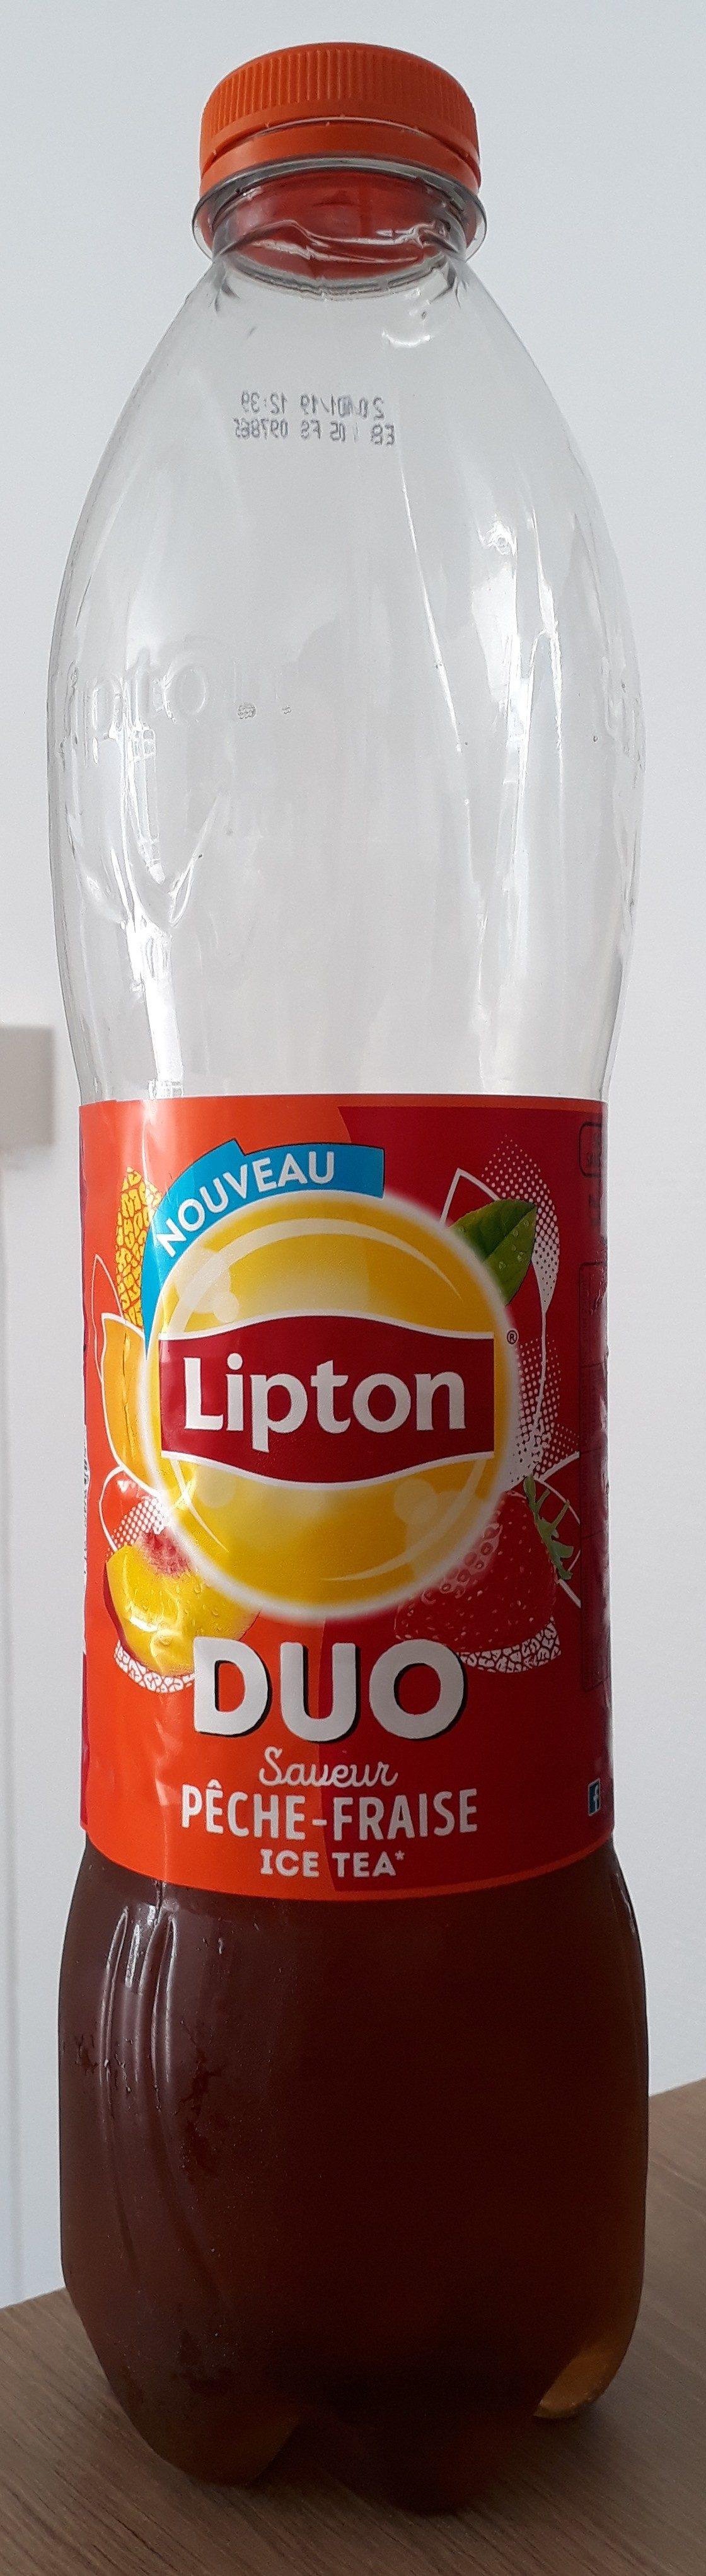 Lipton Ice Tea duo saveur pêche fraise 1,5 L - Prodotto - fr